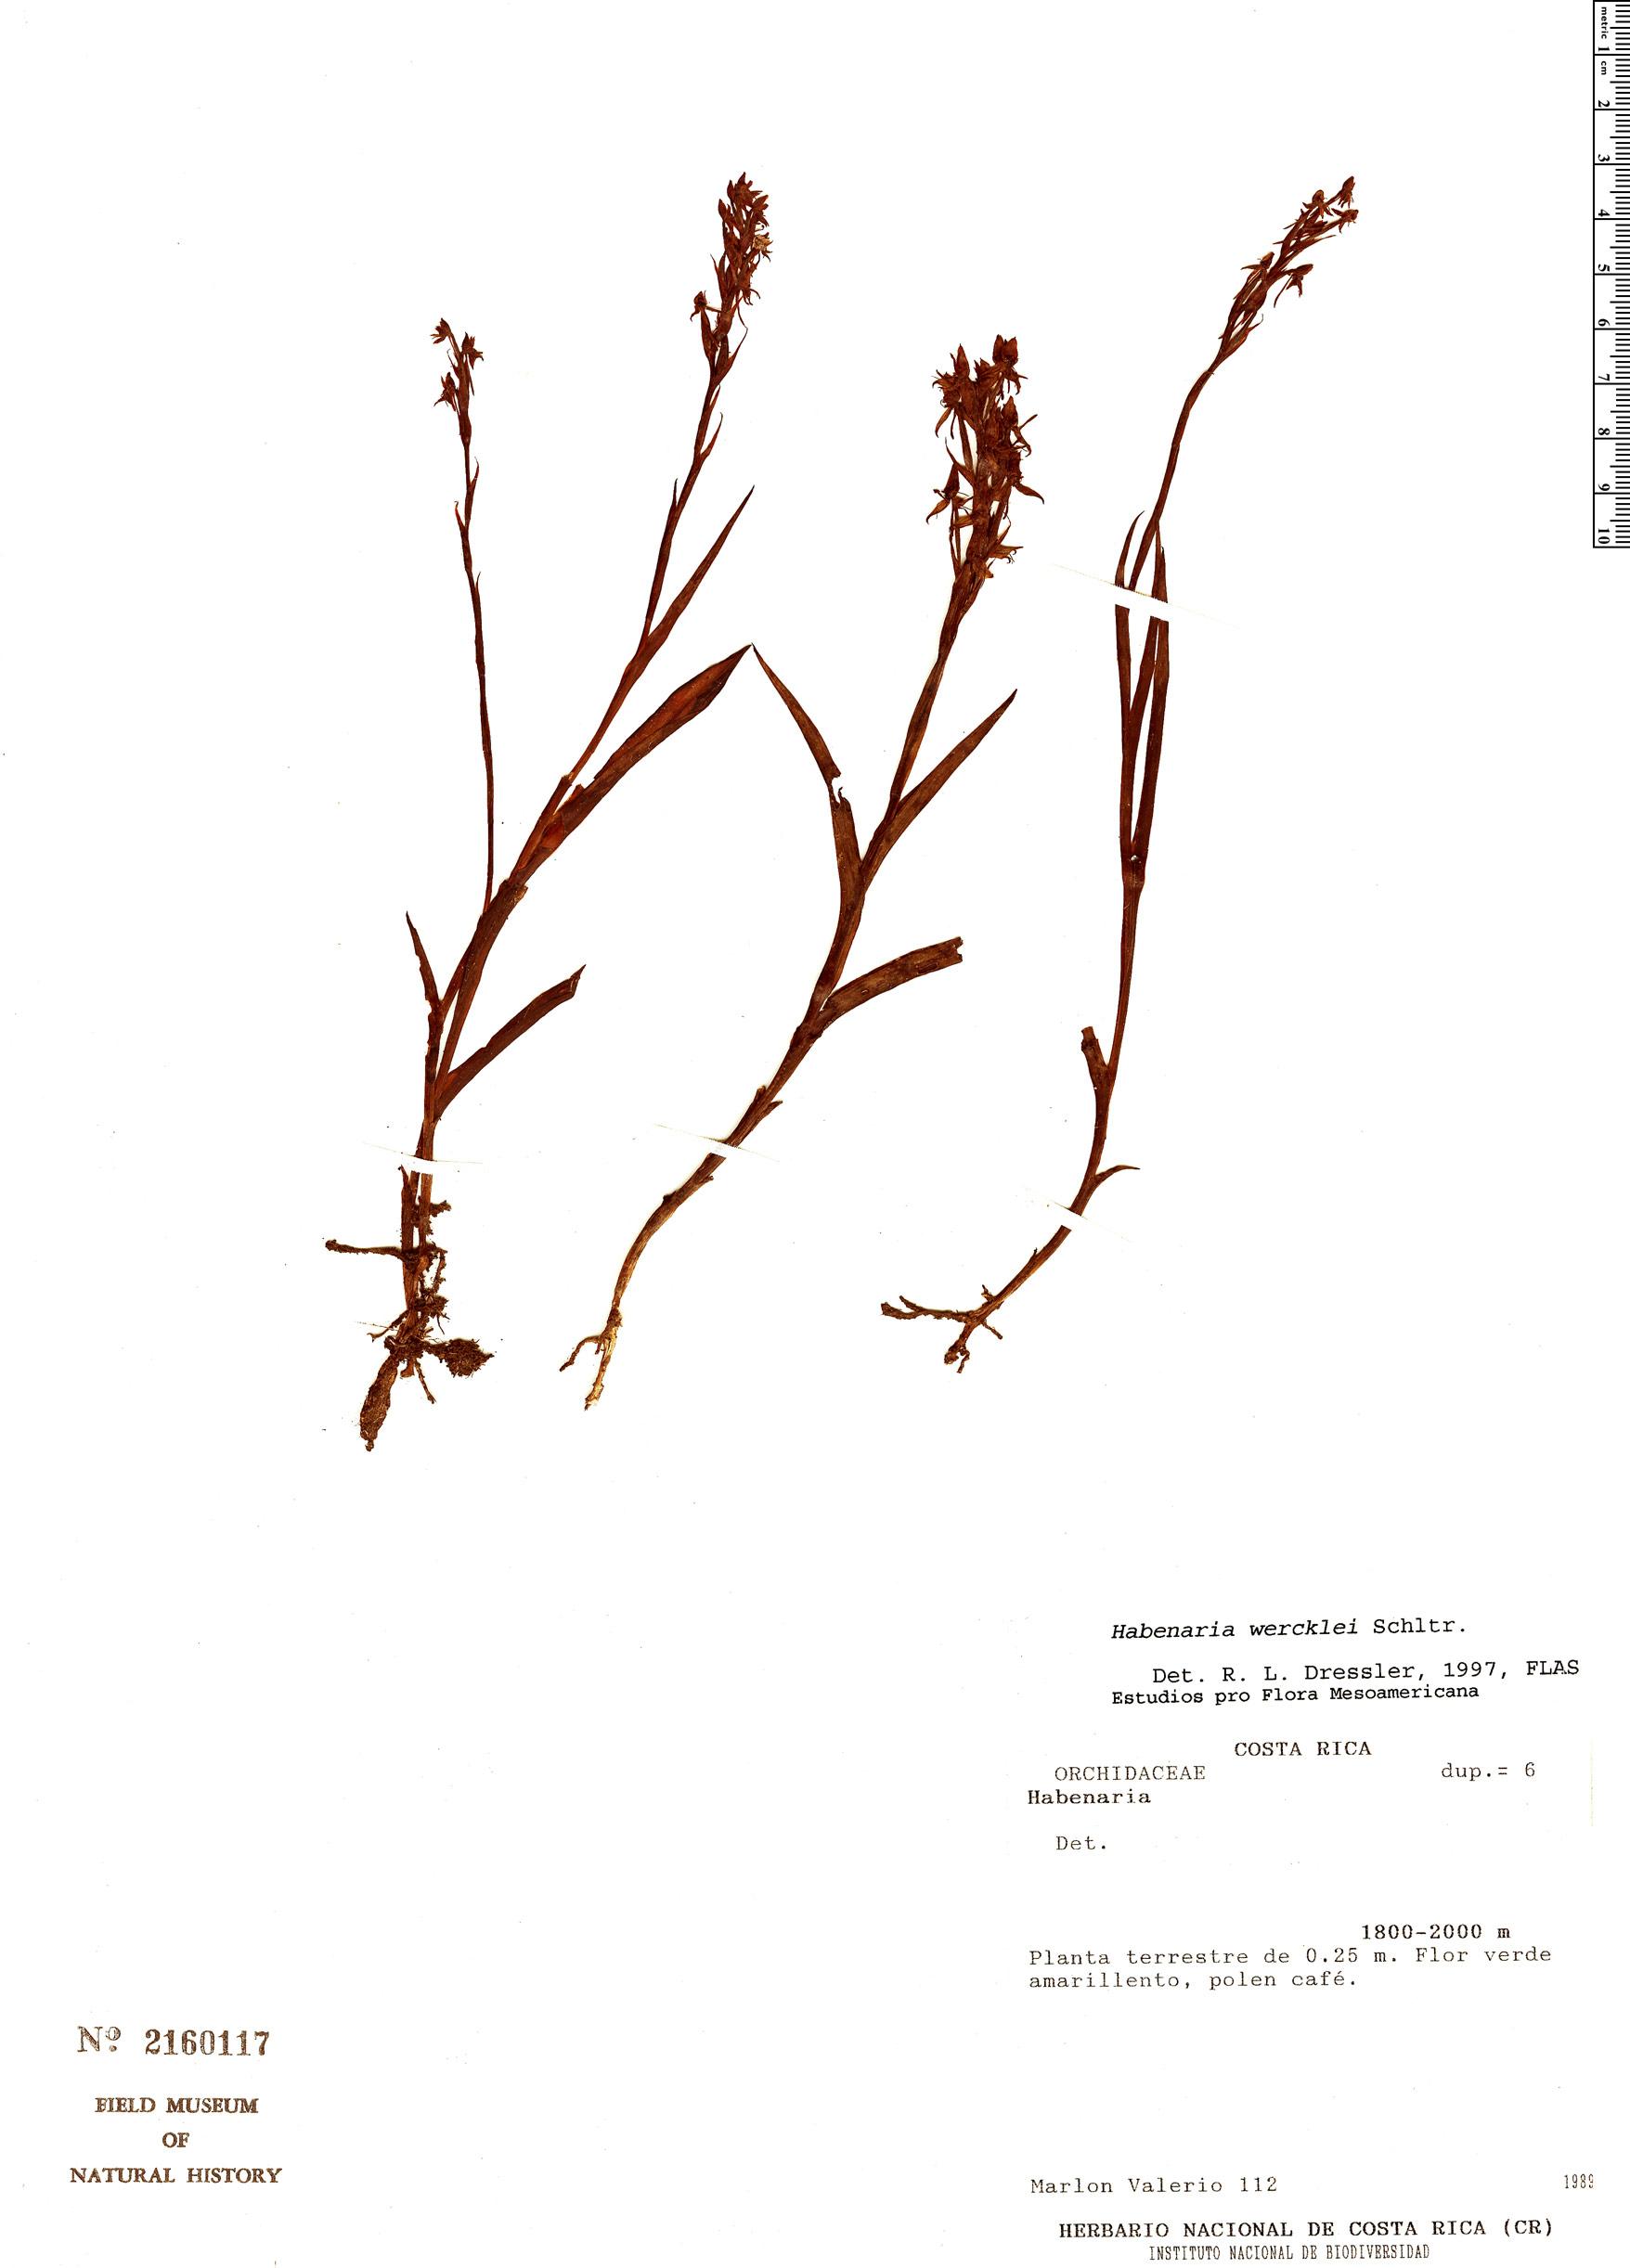 Specimen: Habenaria wercklei